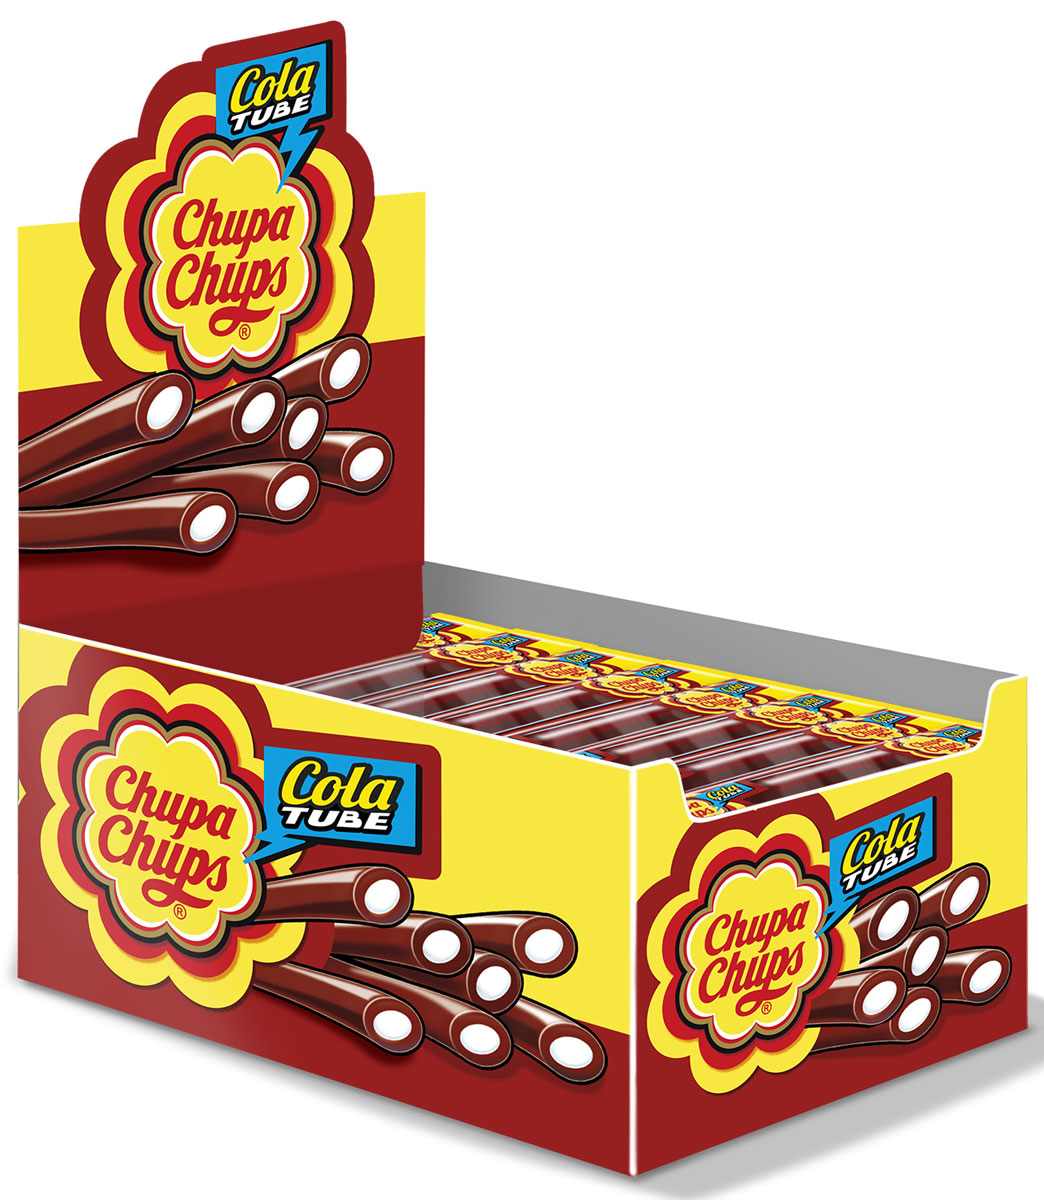 Chupa-Chups Cola Tube жевательный мармелад со вкусом колы, 50 шт по 10 г chupa chups xxl petit карамель ассорти 24 шт по 29 г